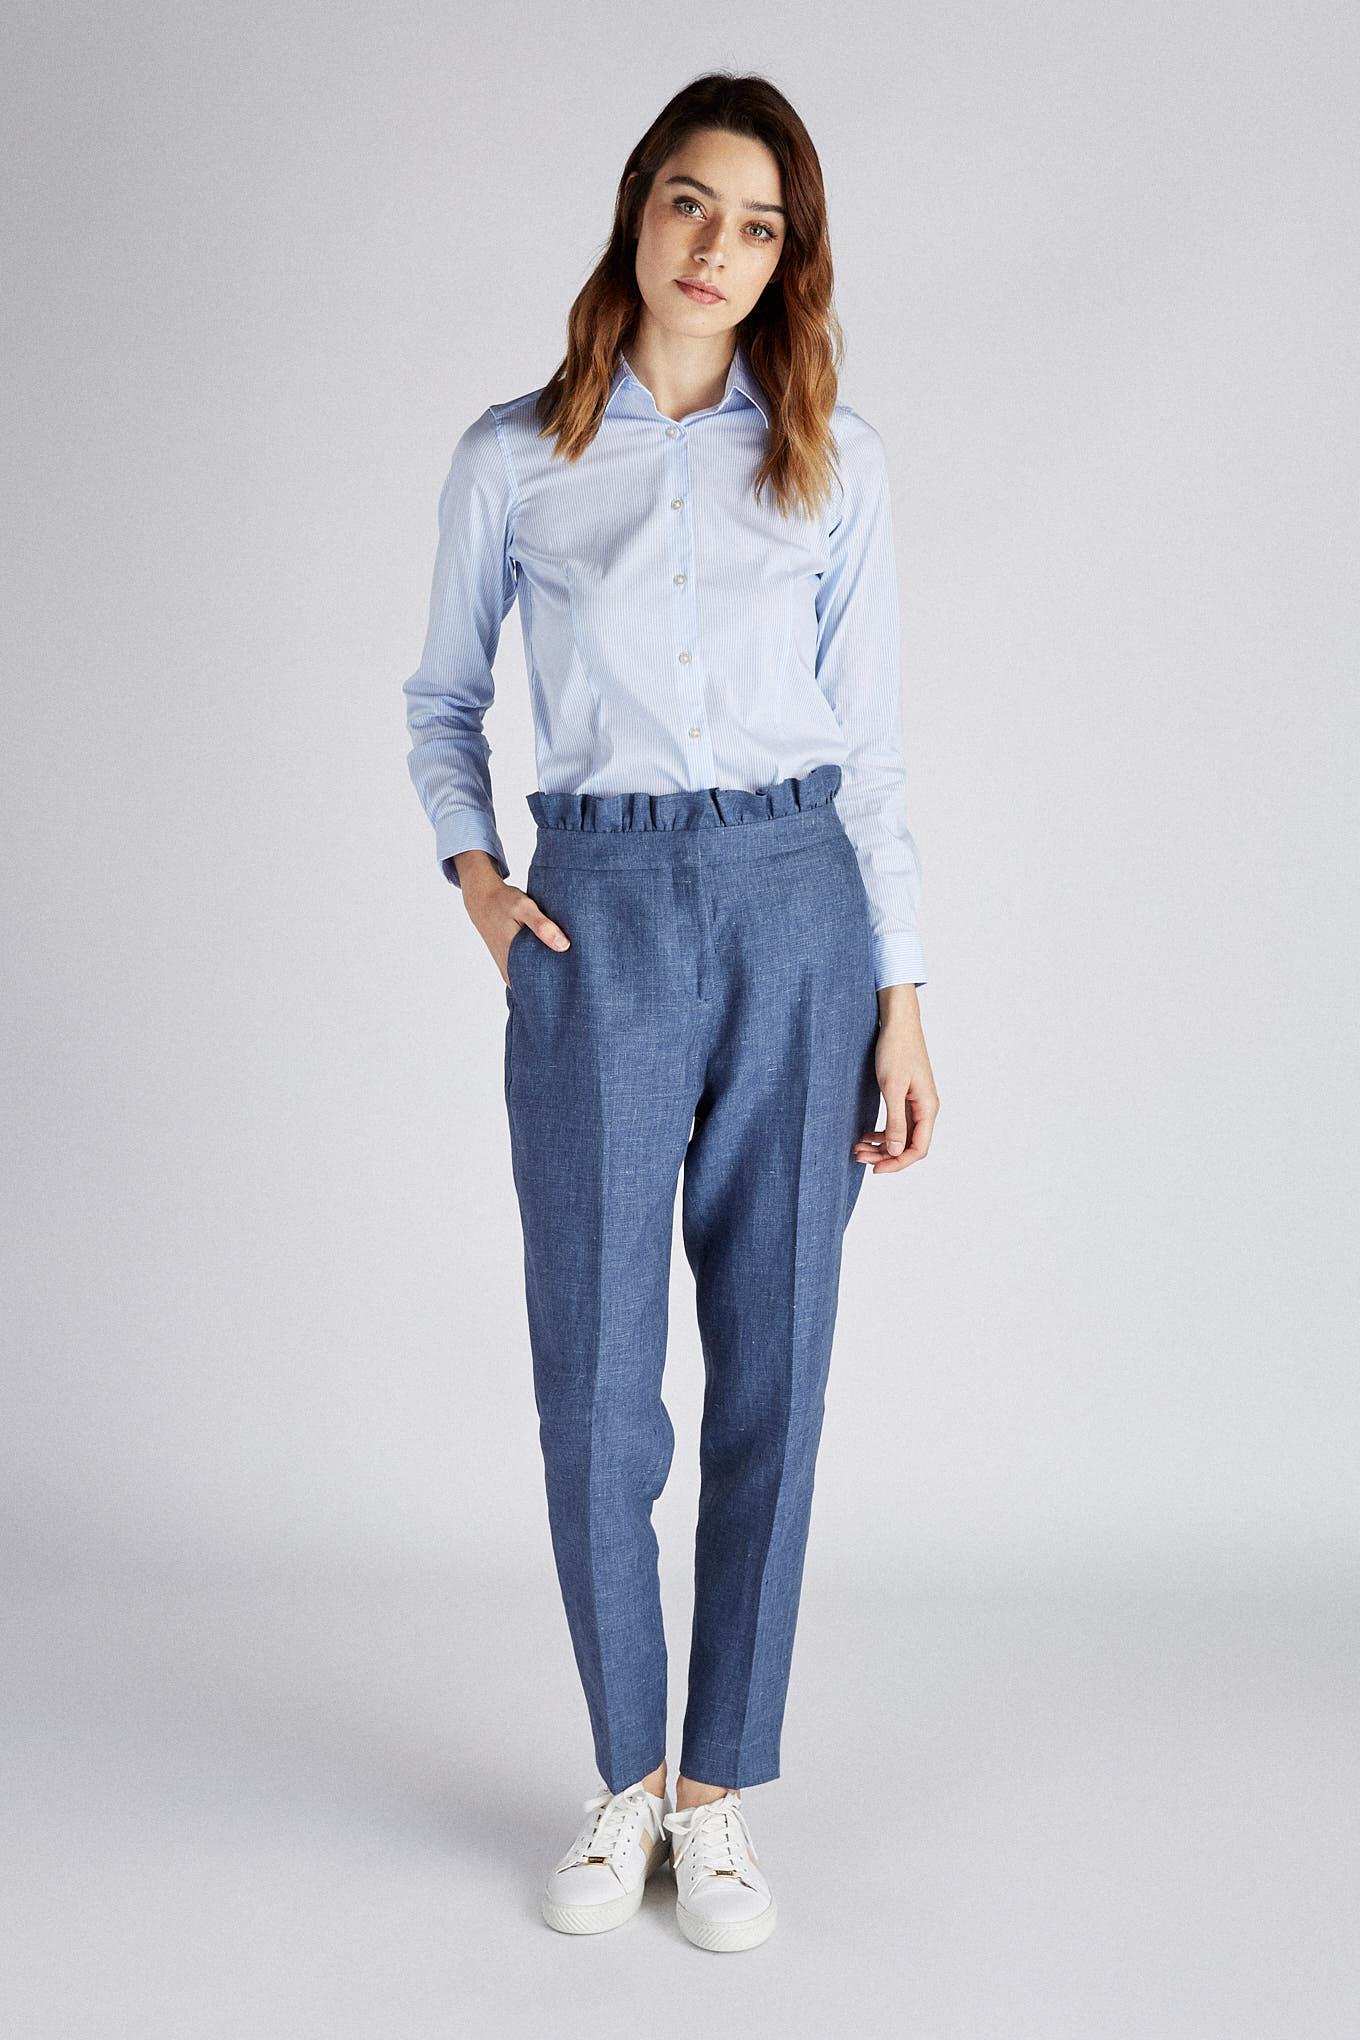 Camisa Azul Claro Classic Mulher